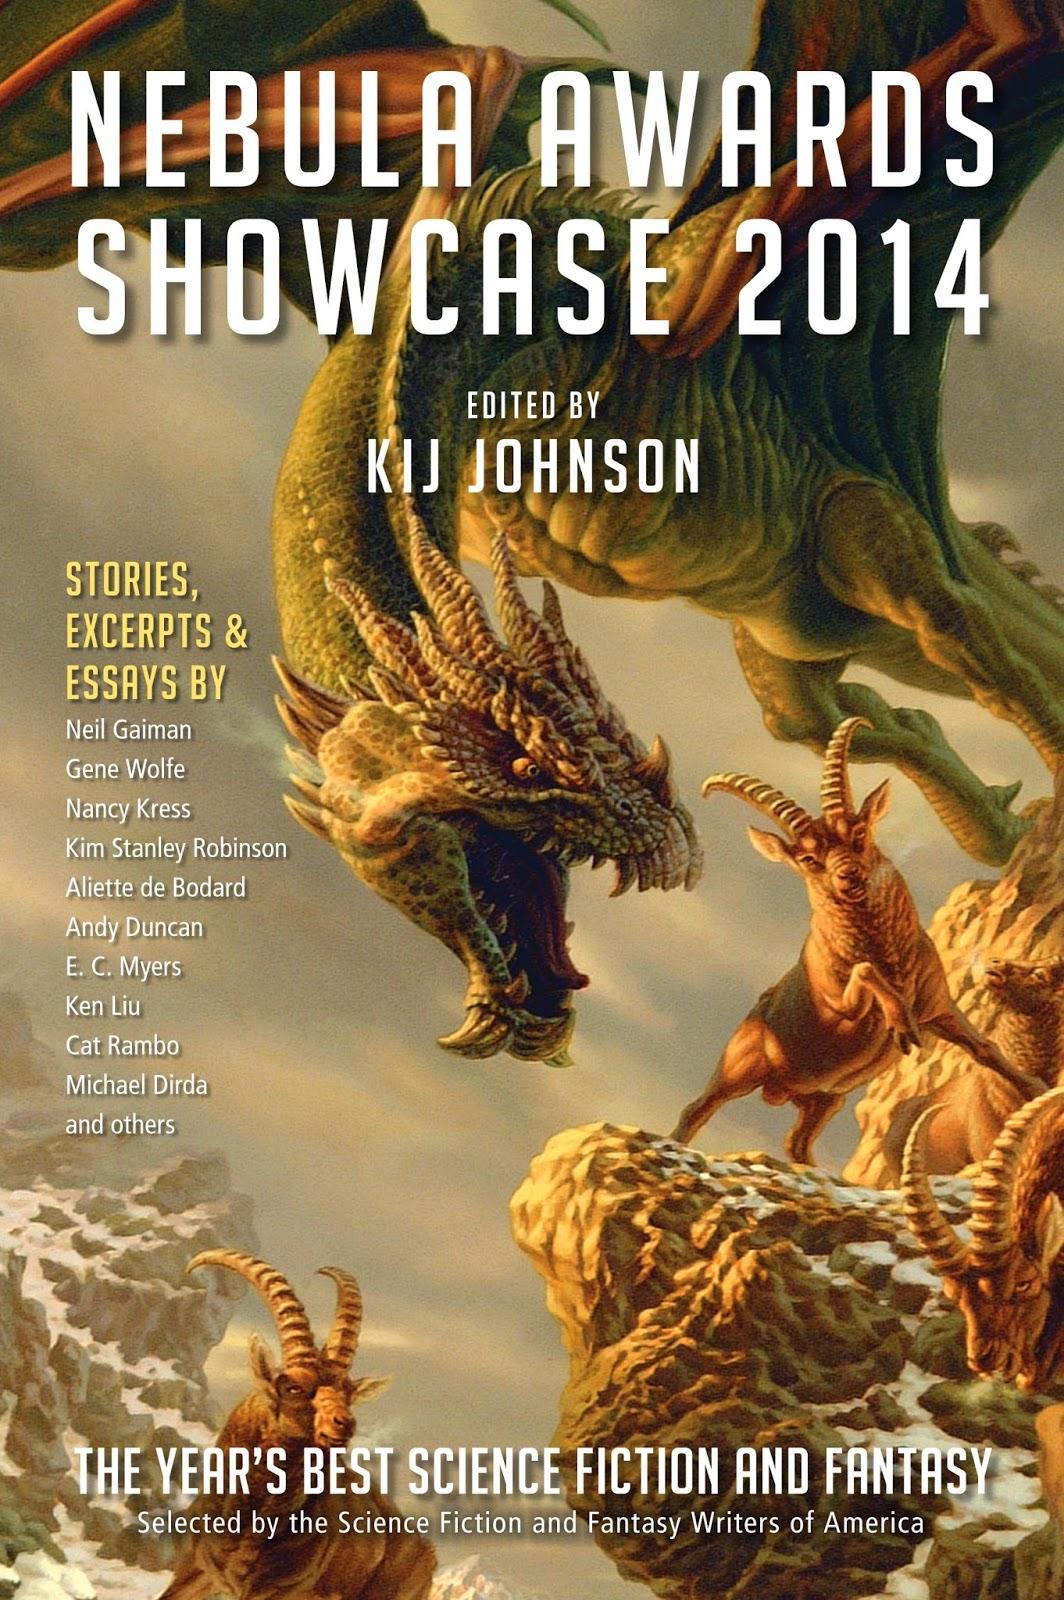 The Nebula Awards Showcase 2014 edited by Kij Johnson